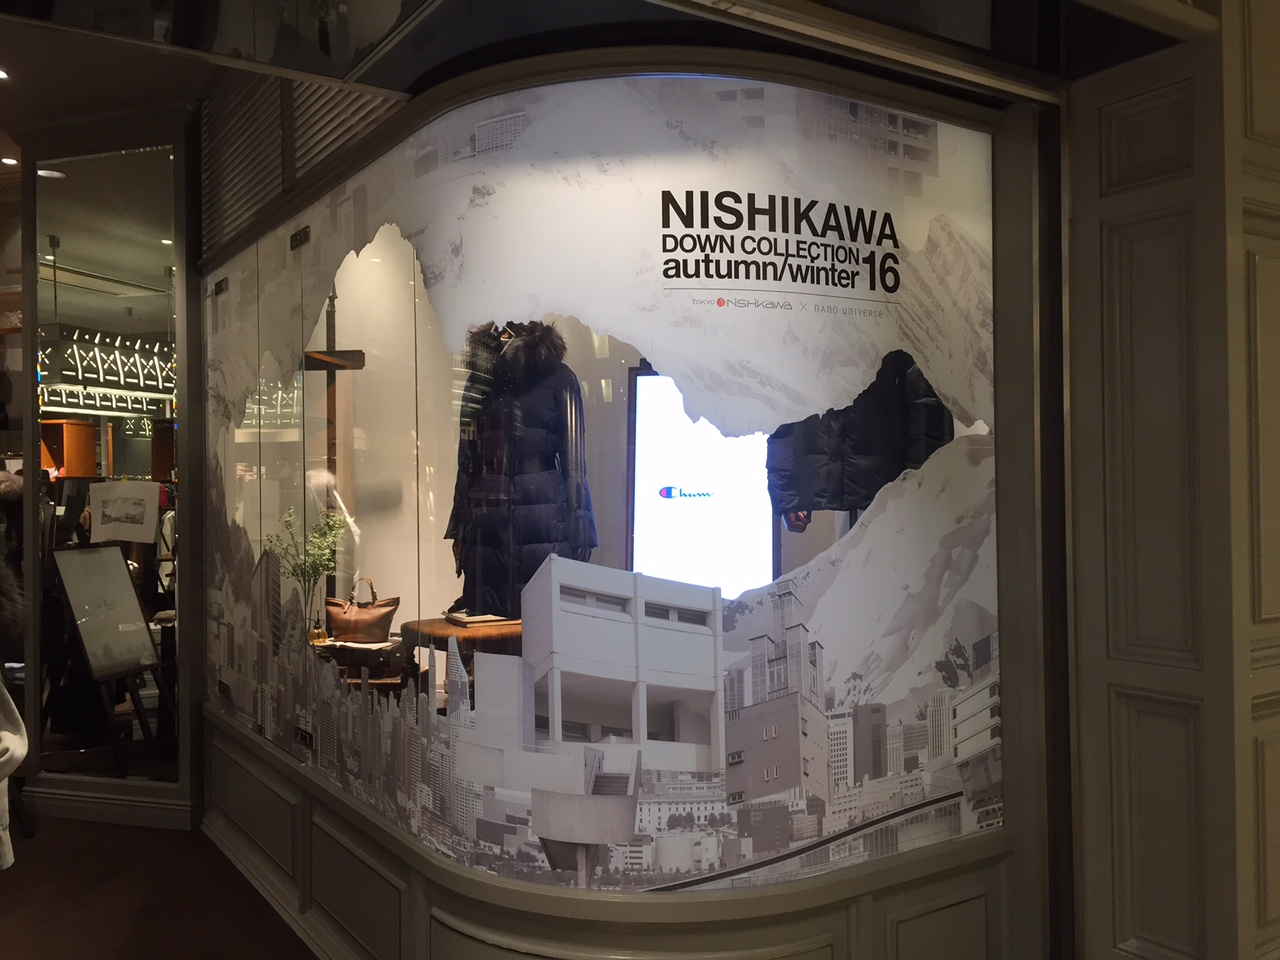 NISHIKAWA DOWN COLLECTION autumn/winter 2016